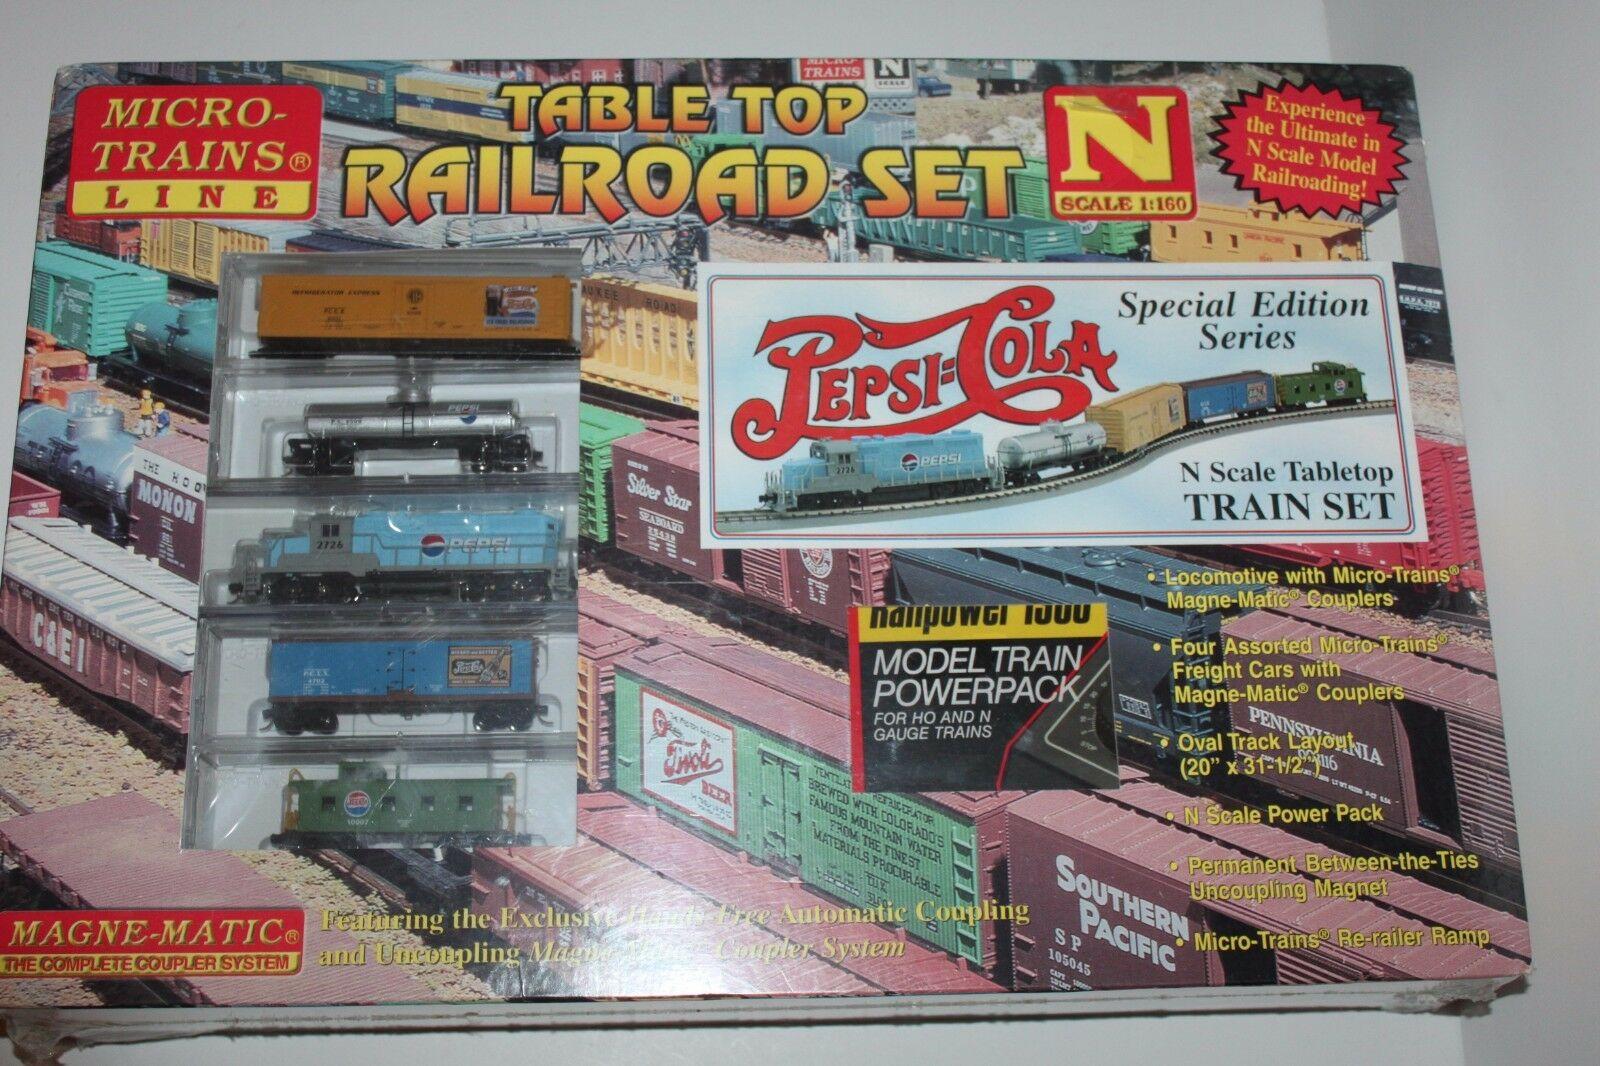 N Scale - Micro-Trains - 1501 - Freight Train, Diesel, North American, 2nd Generation Diesel Era - Pepsi - Freight Train